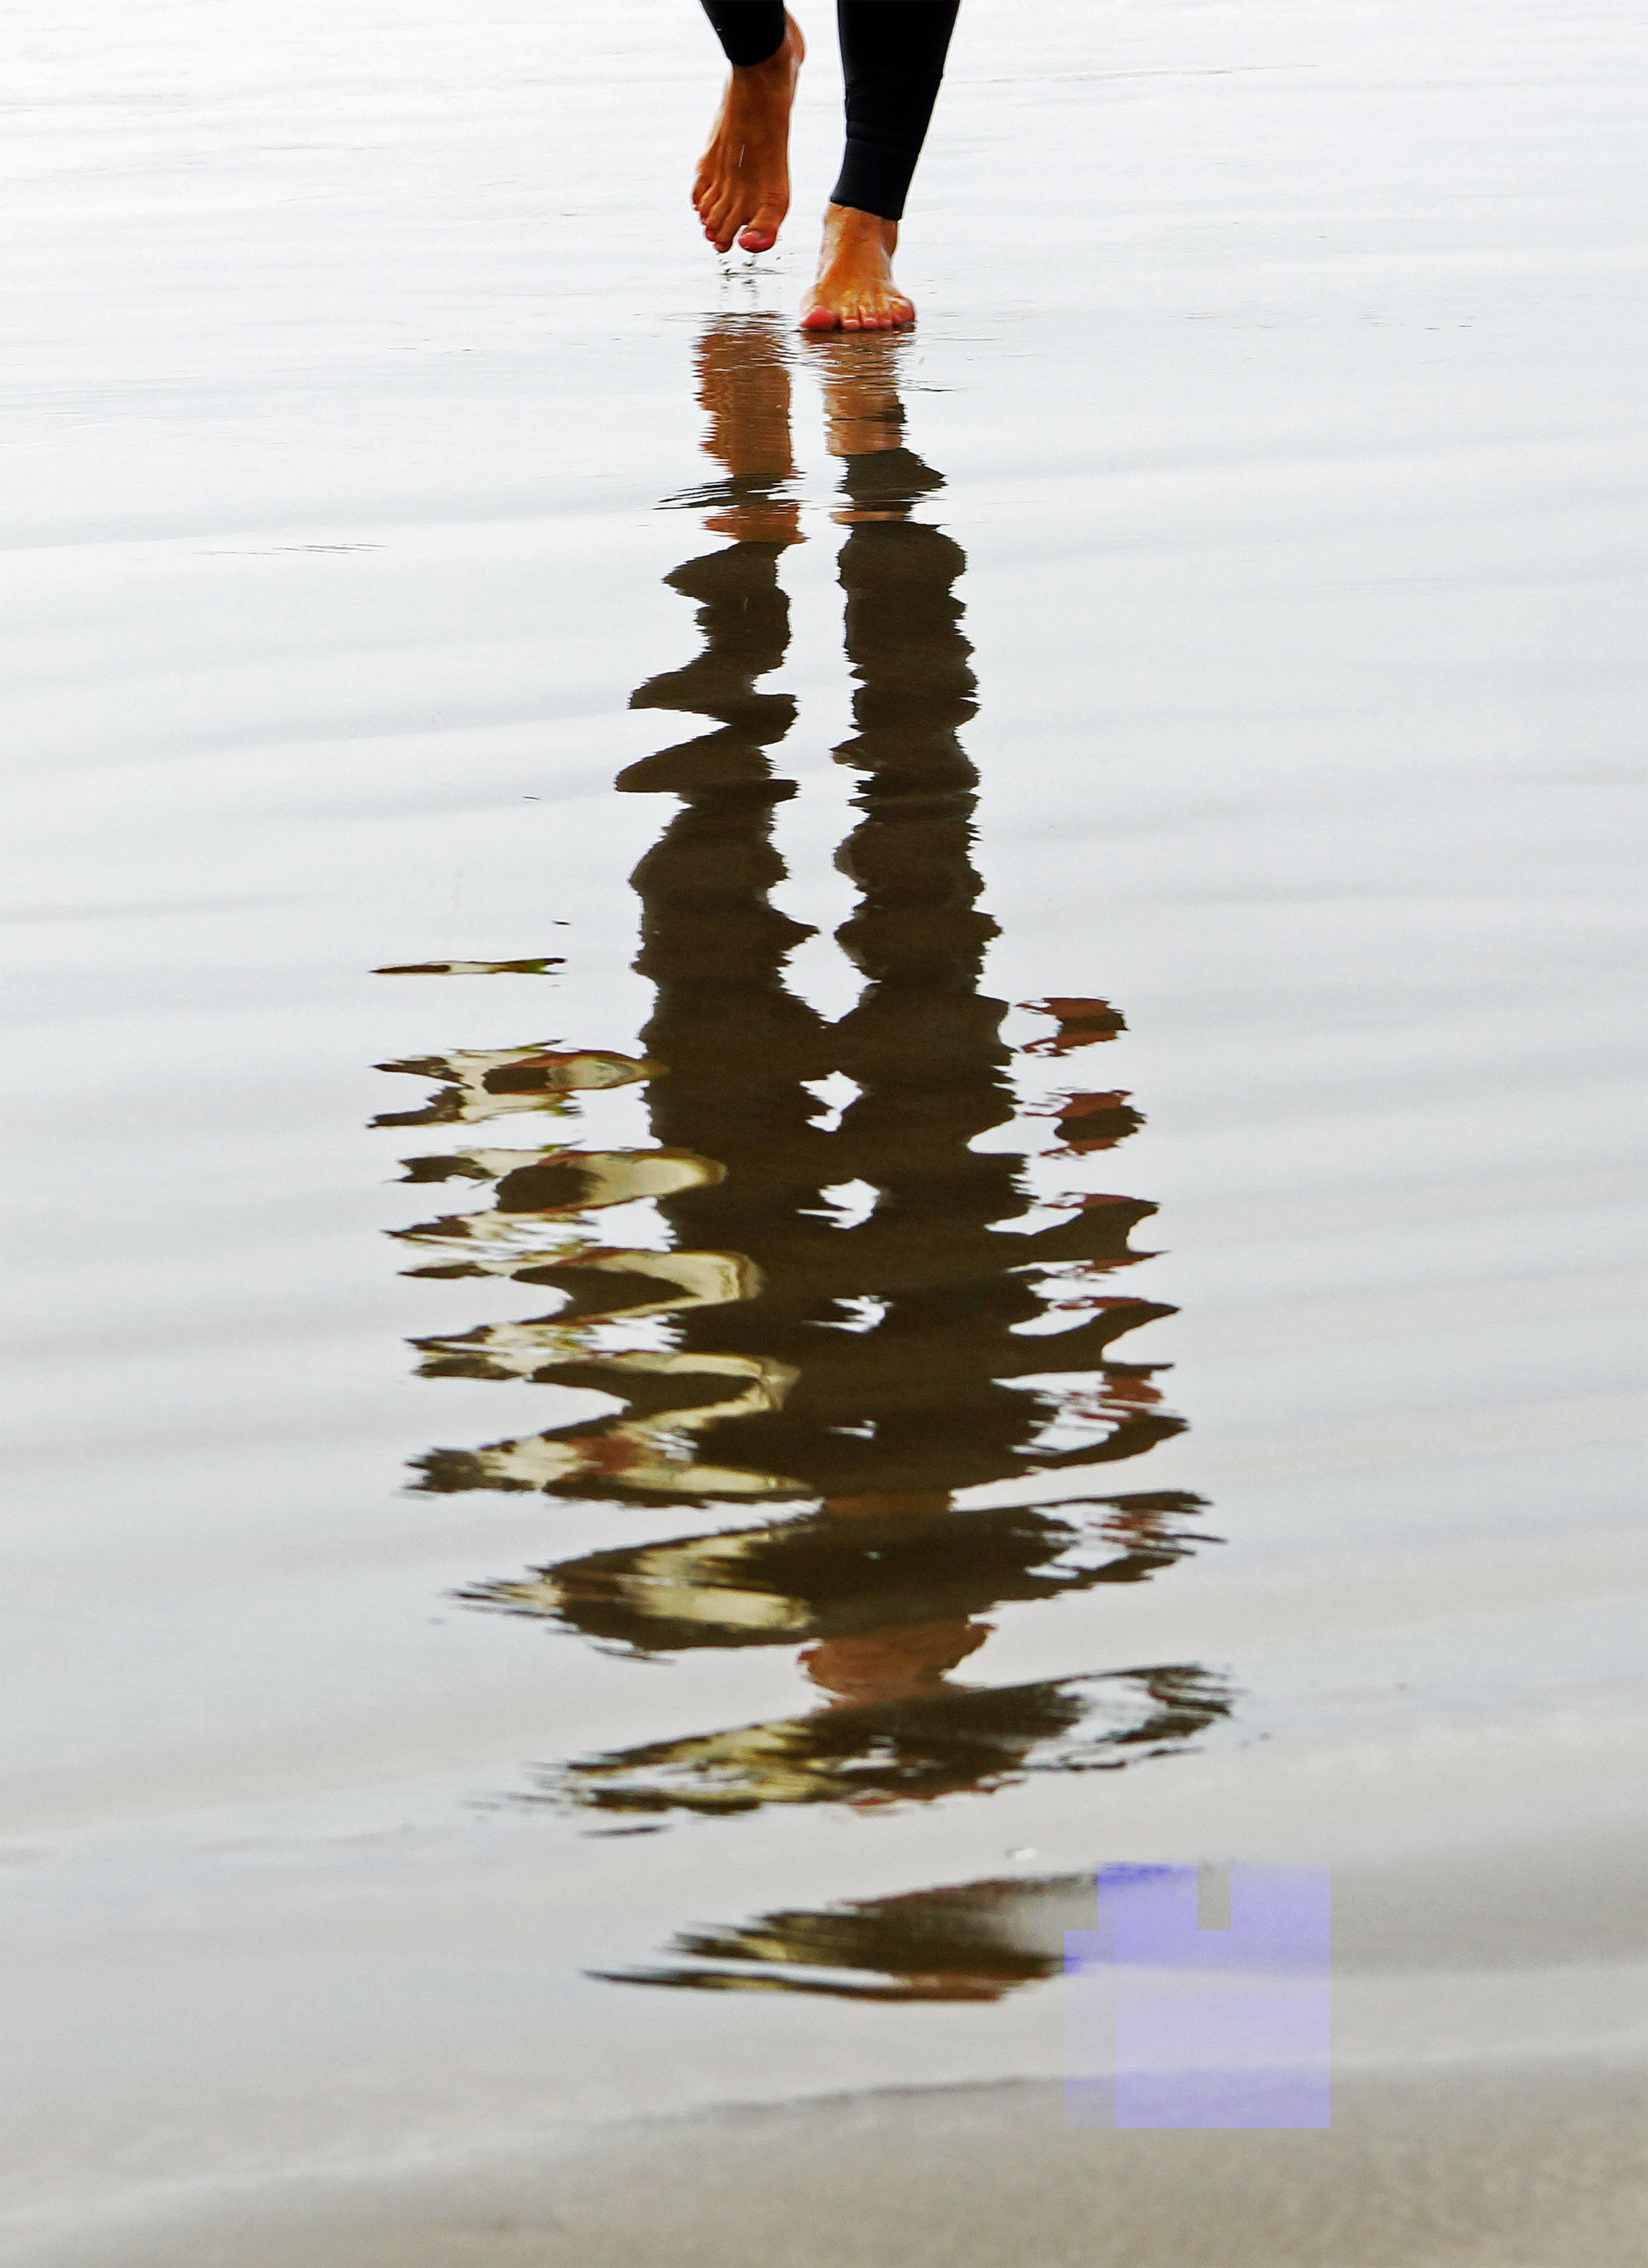 reflection_1_big.jpg